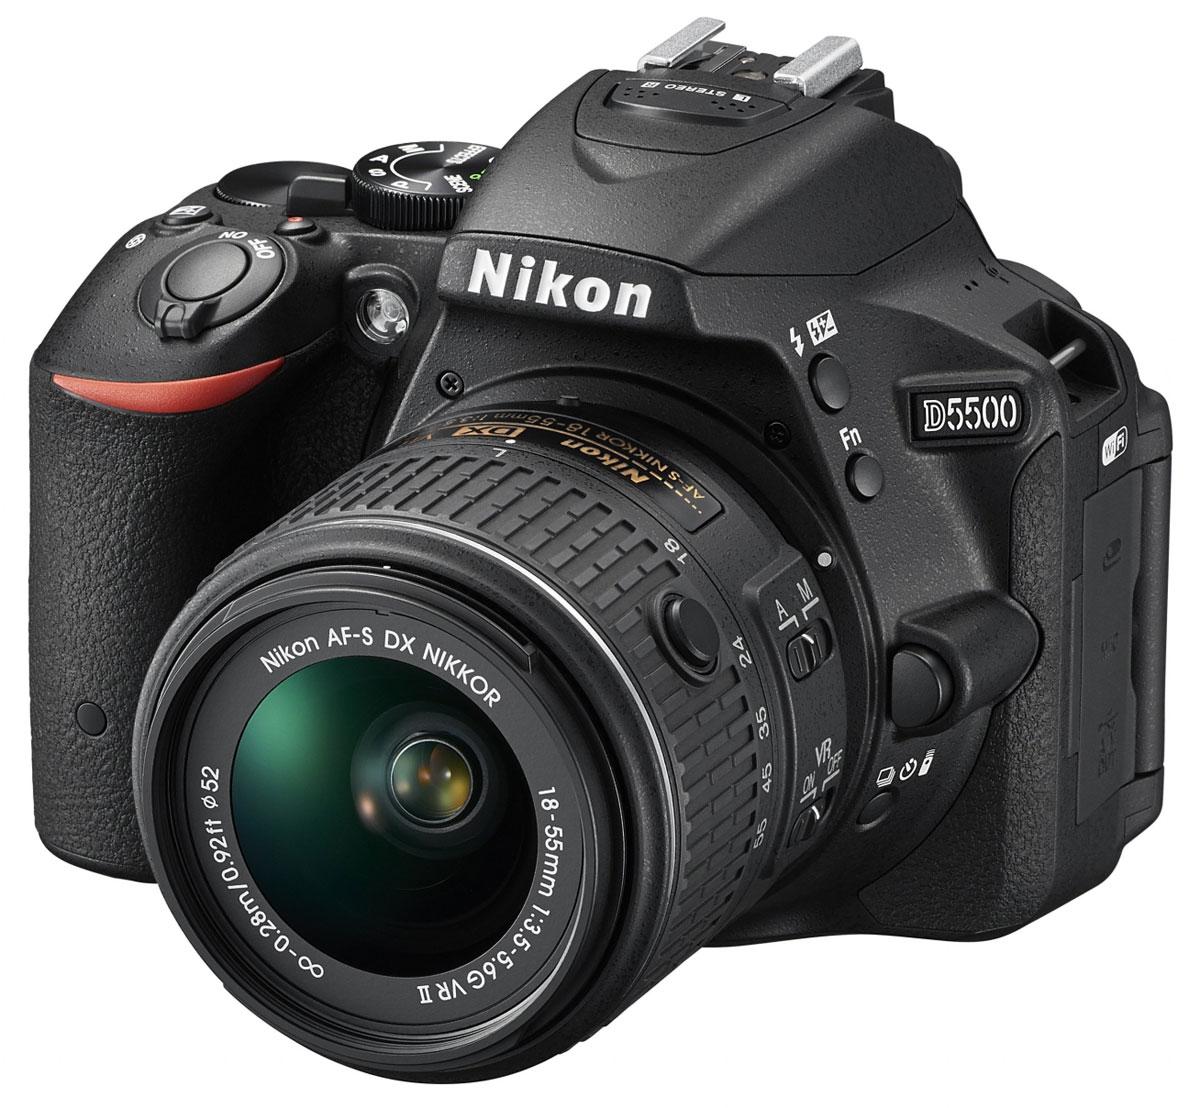 Nikon D5500 Kit 18-55 VR II, Black цифровая зеркальная фотокамера ( VBA440K001 )